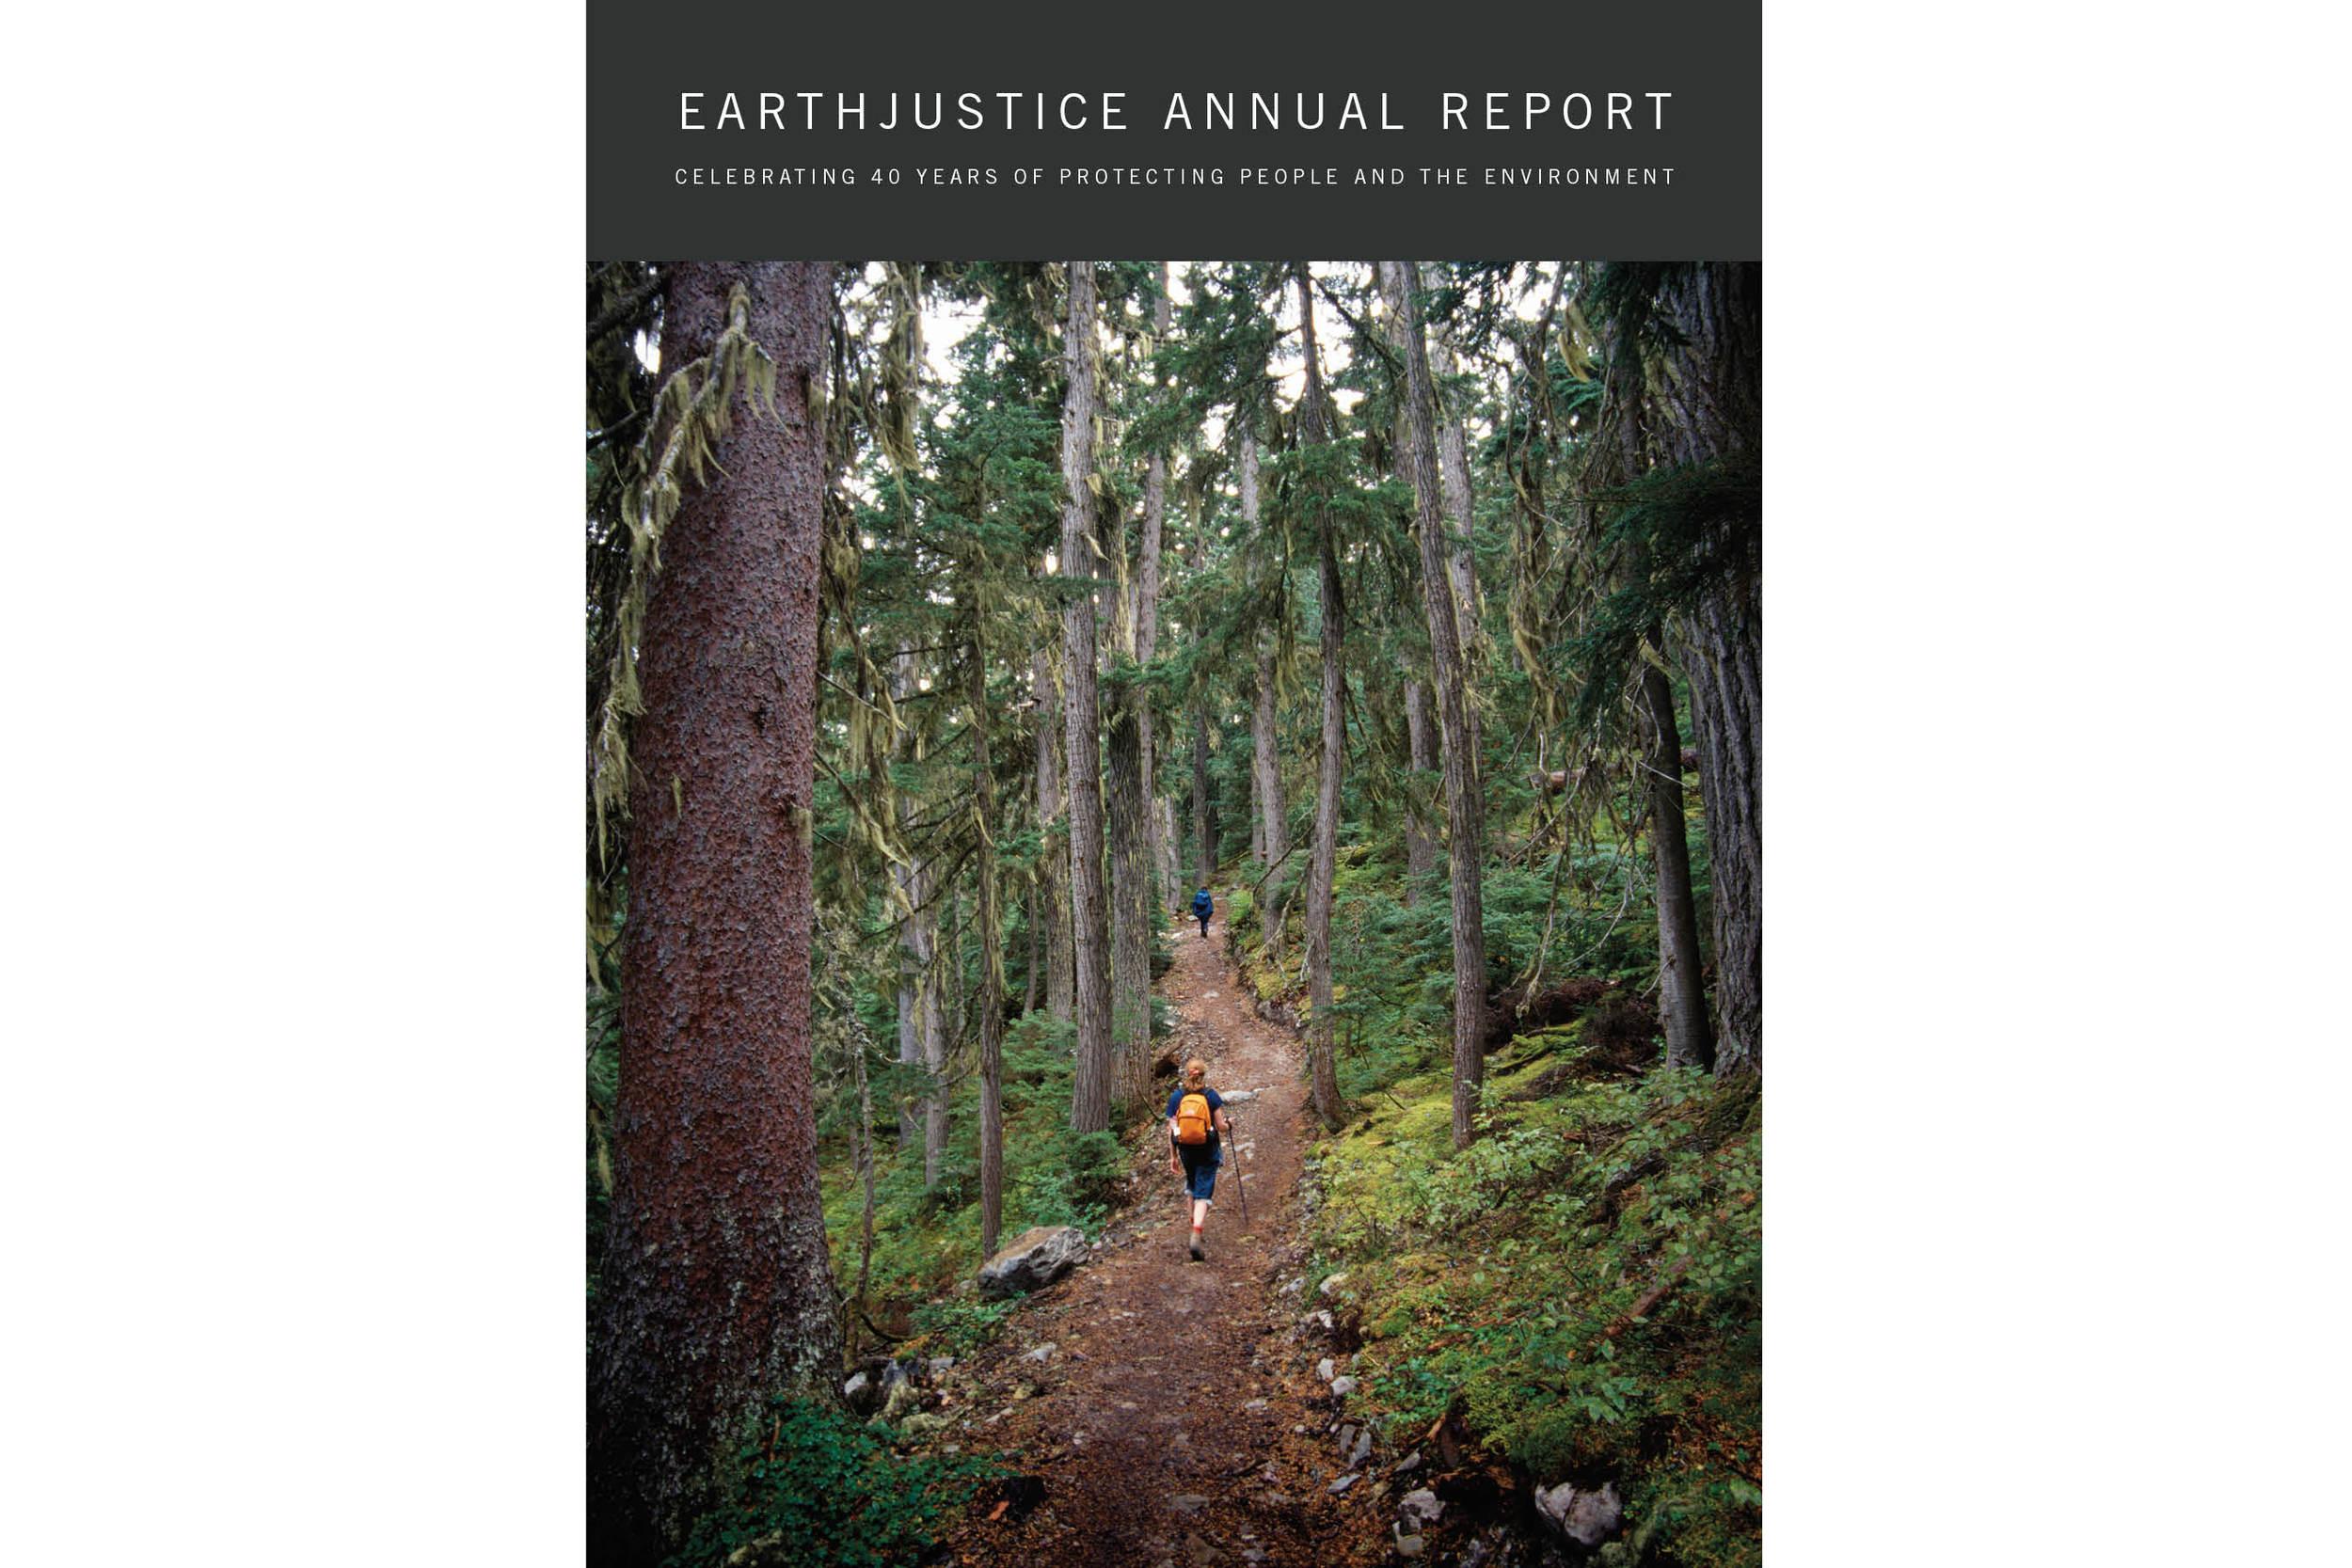 earthjustice19.jpg